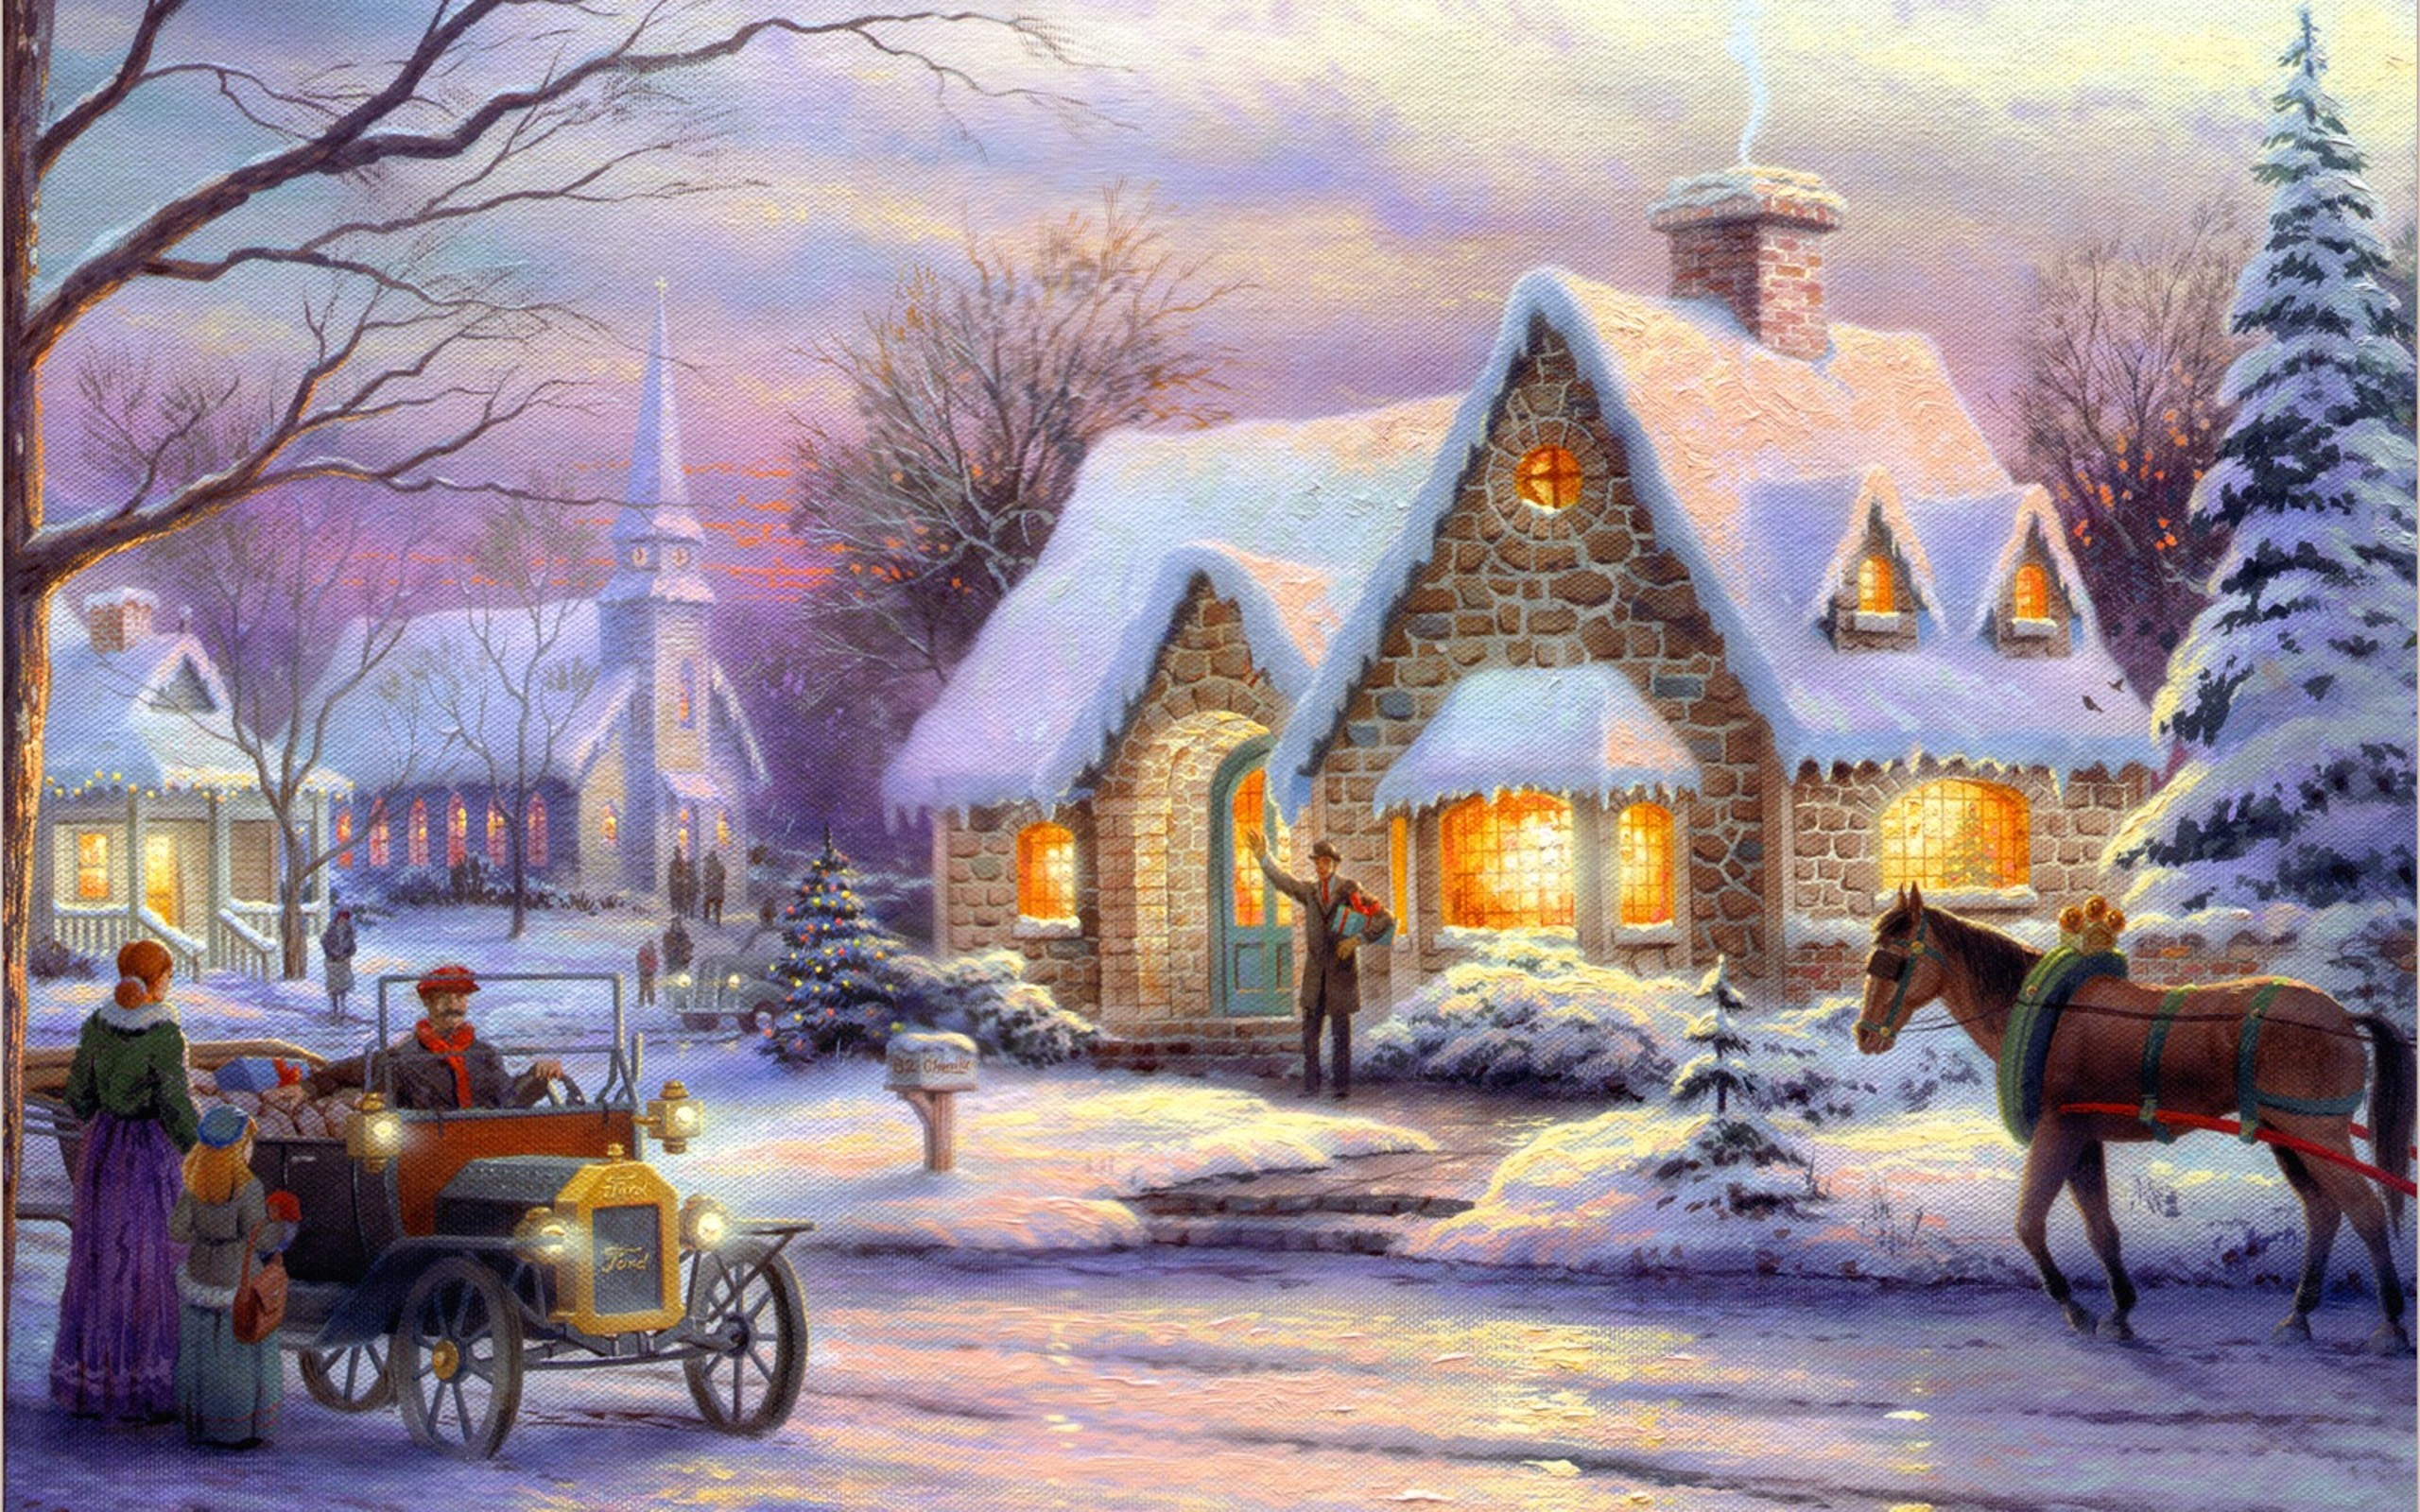 Thomas Kinkade Christmas Village (23)